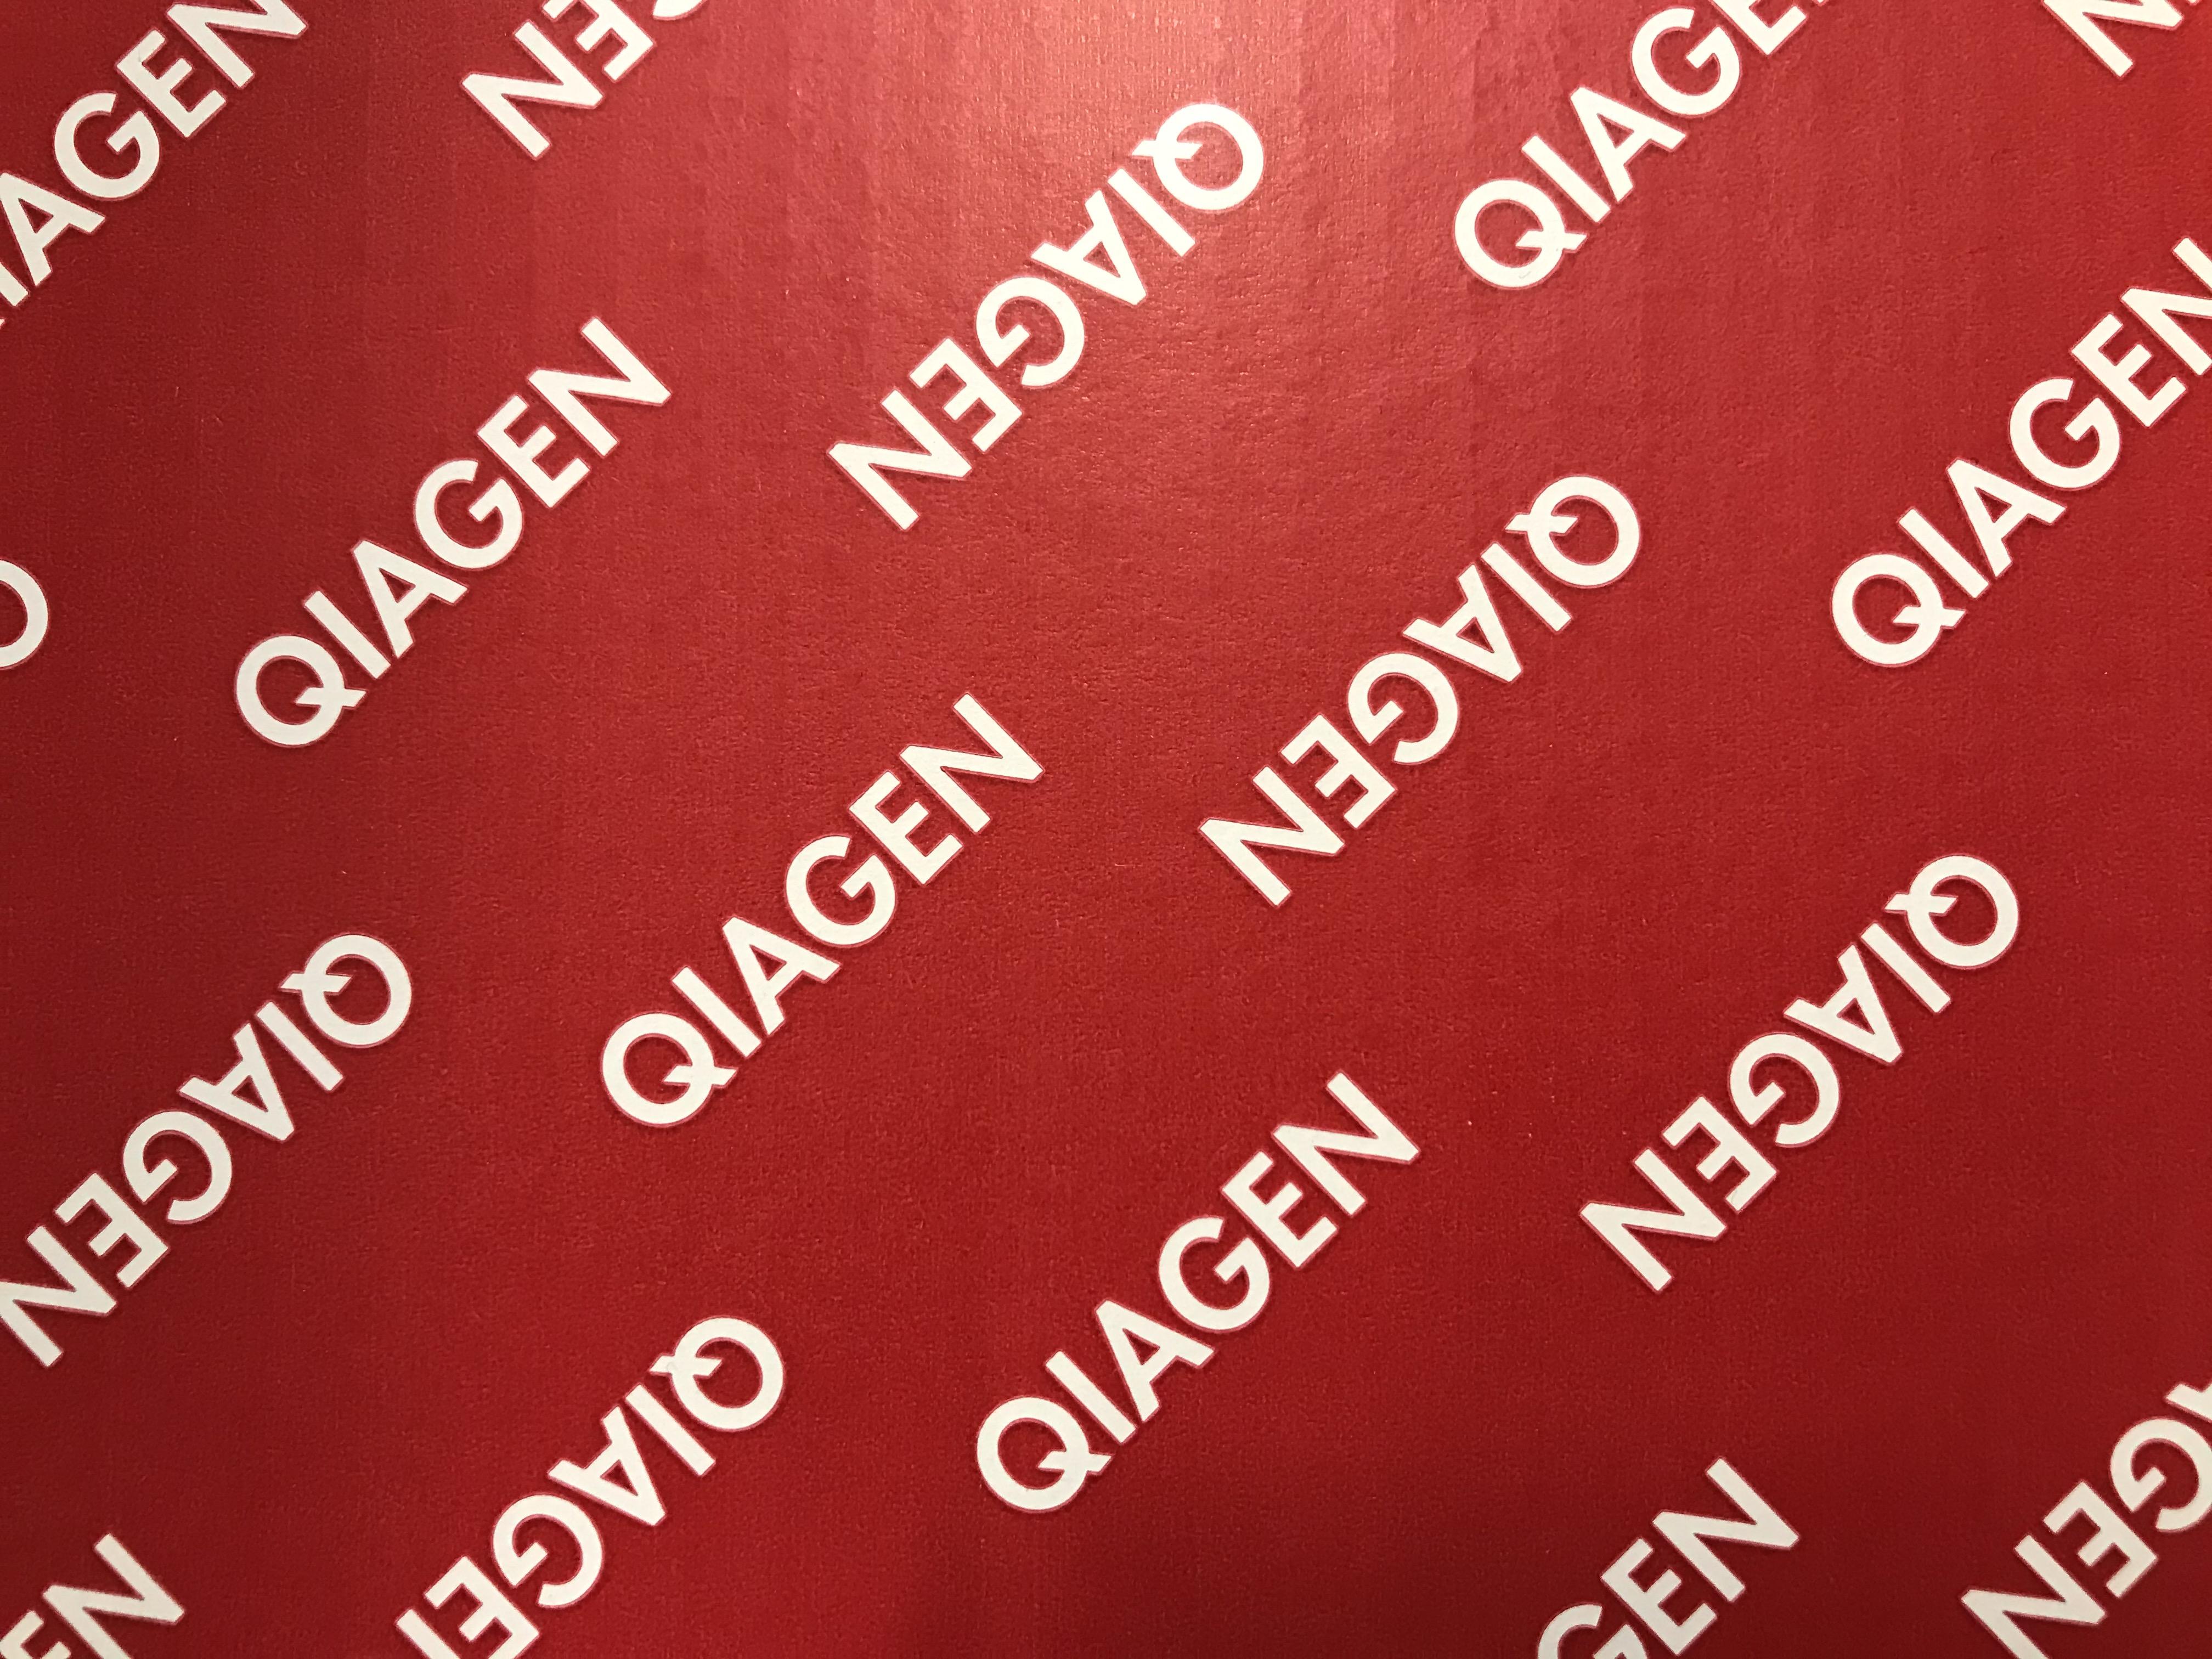 RNA kit - Qiagen/Thermo